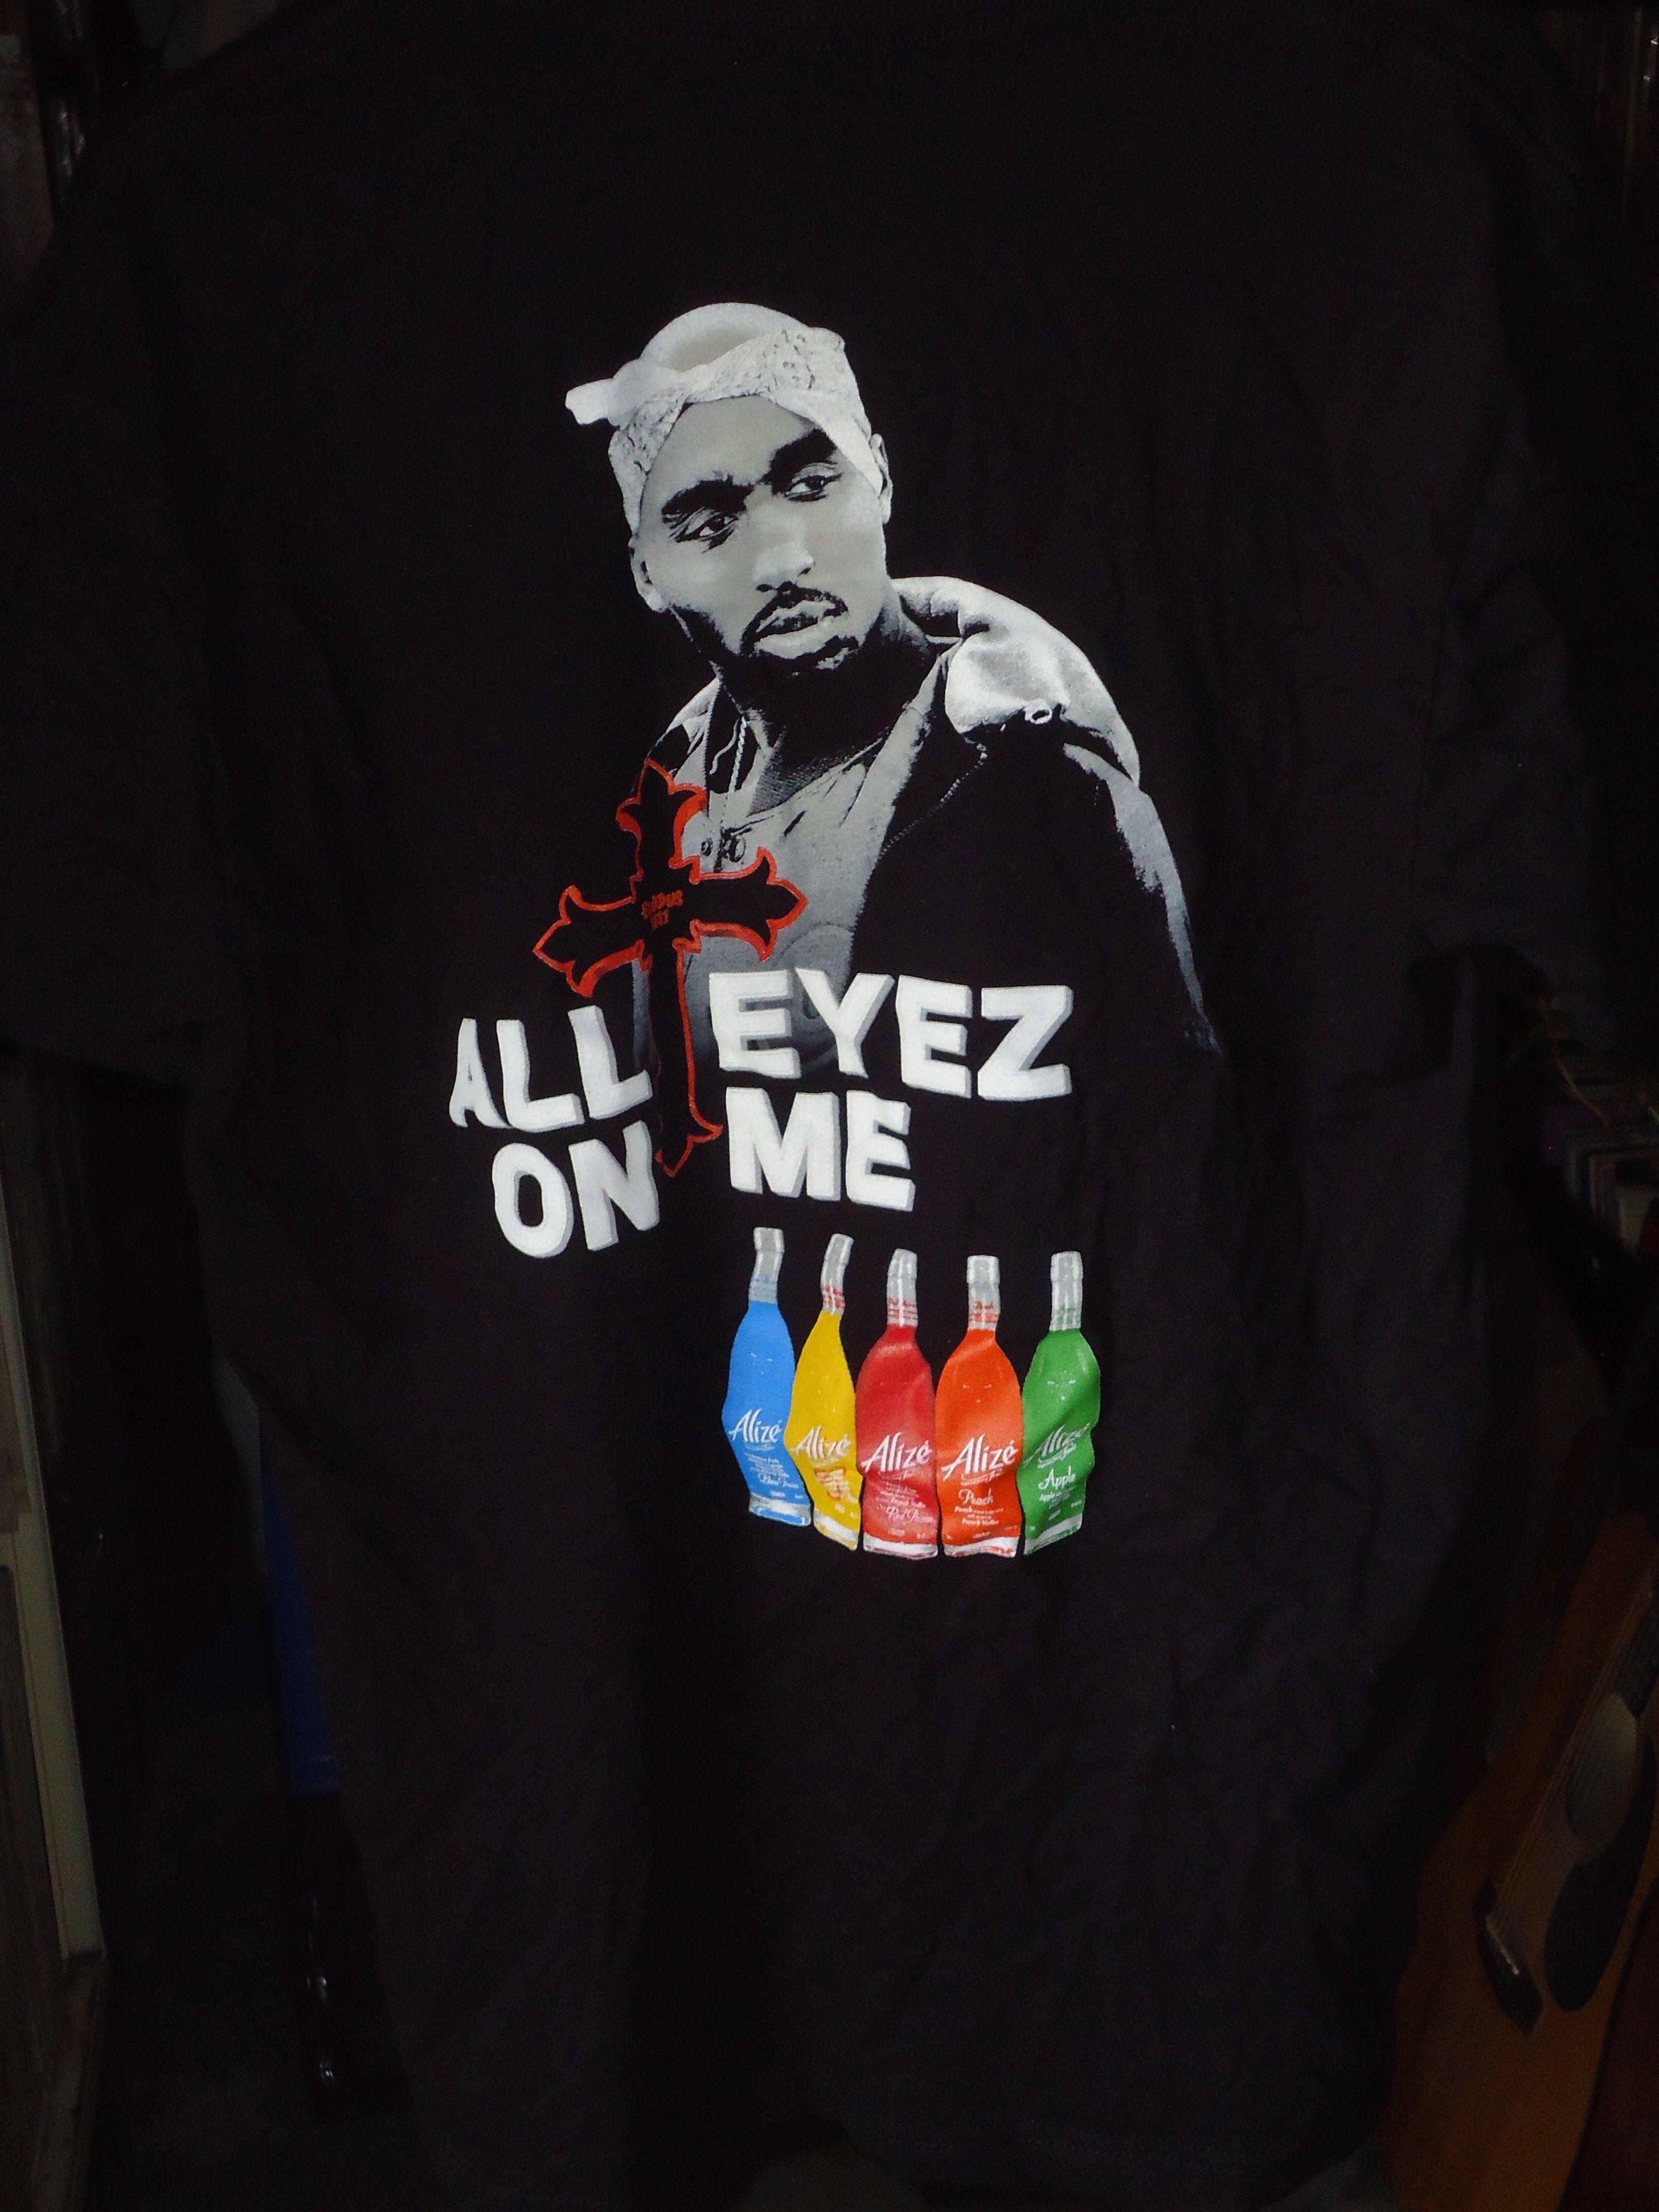 52737b1a Vintage - Tupac - 2Pac - All Eyez On Me - Alize - T-shirt - Black ...